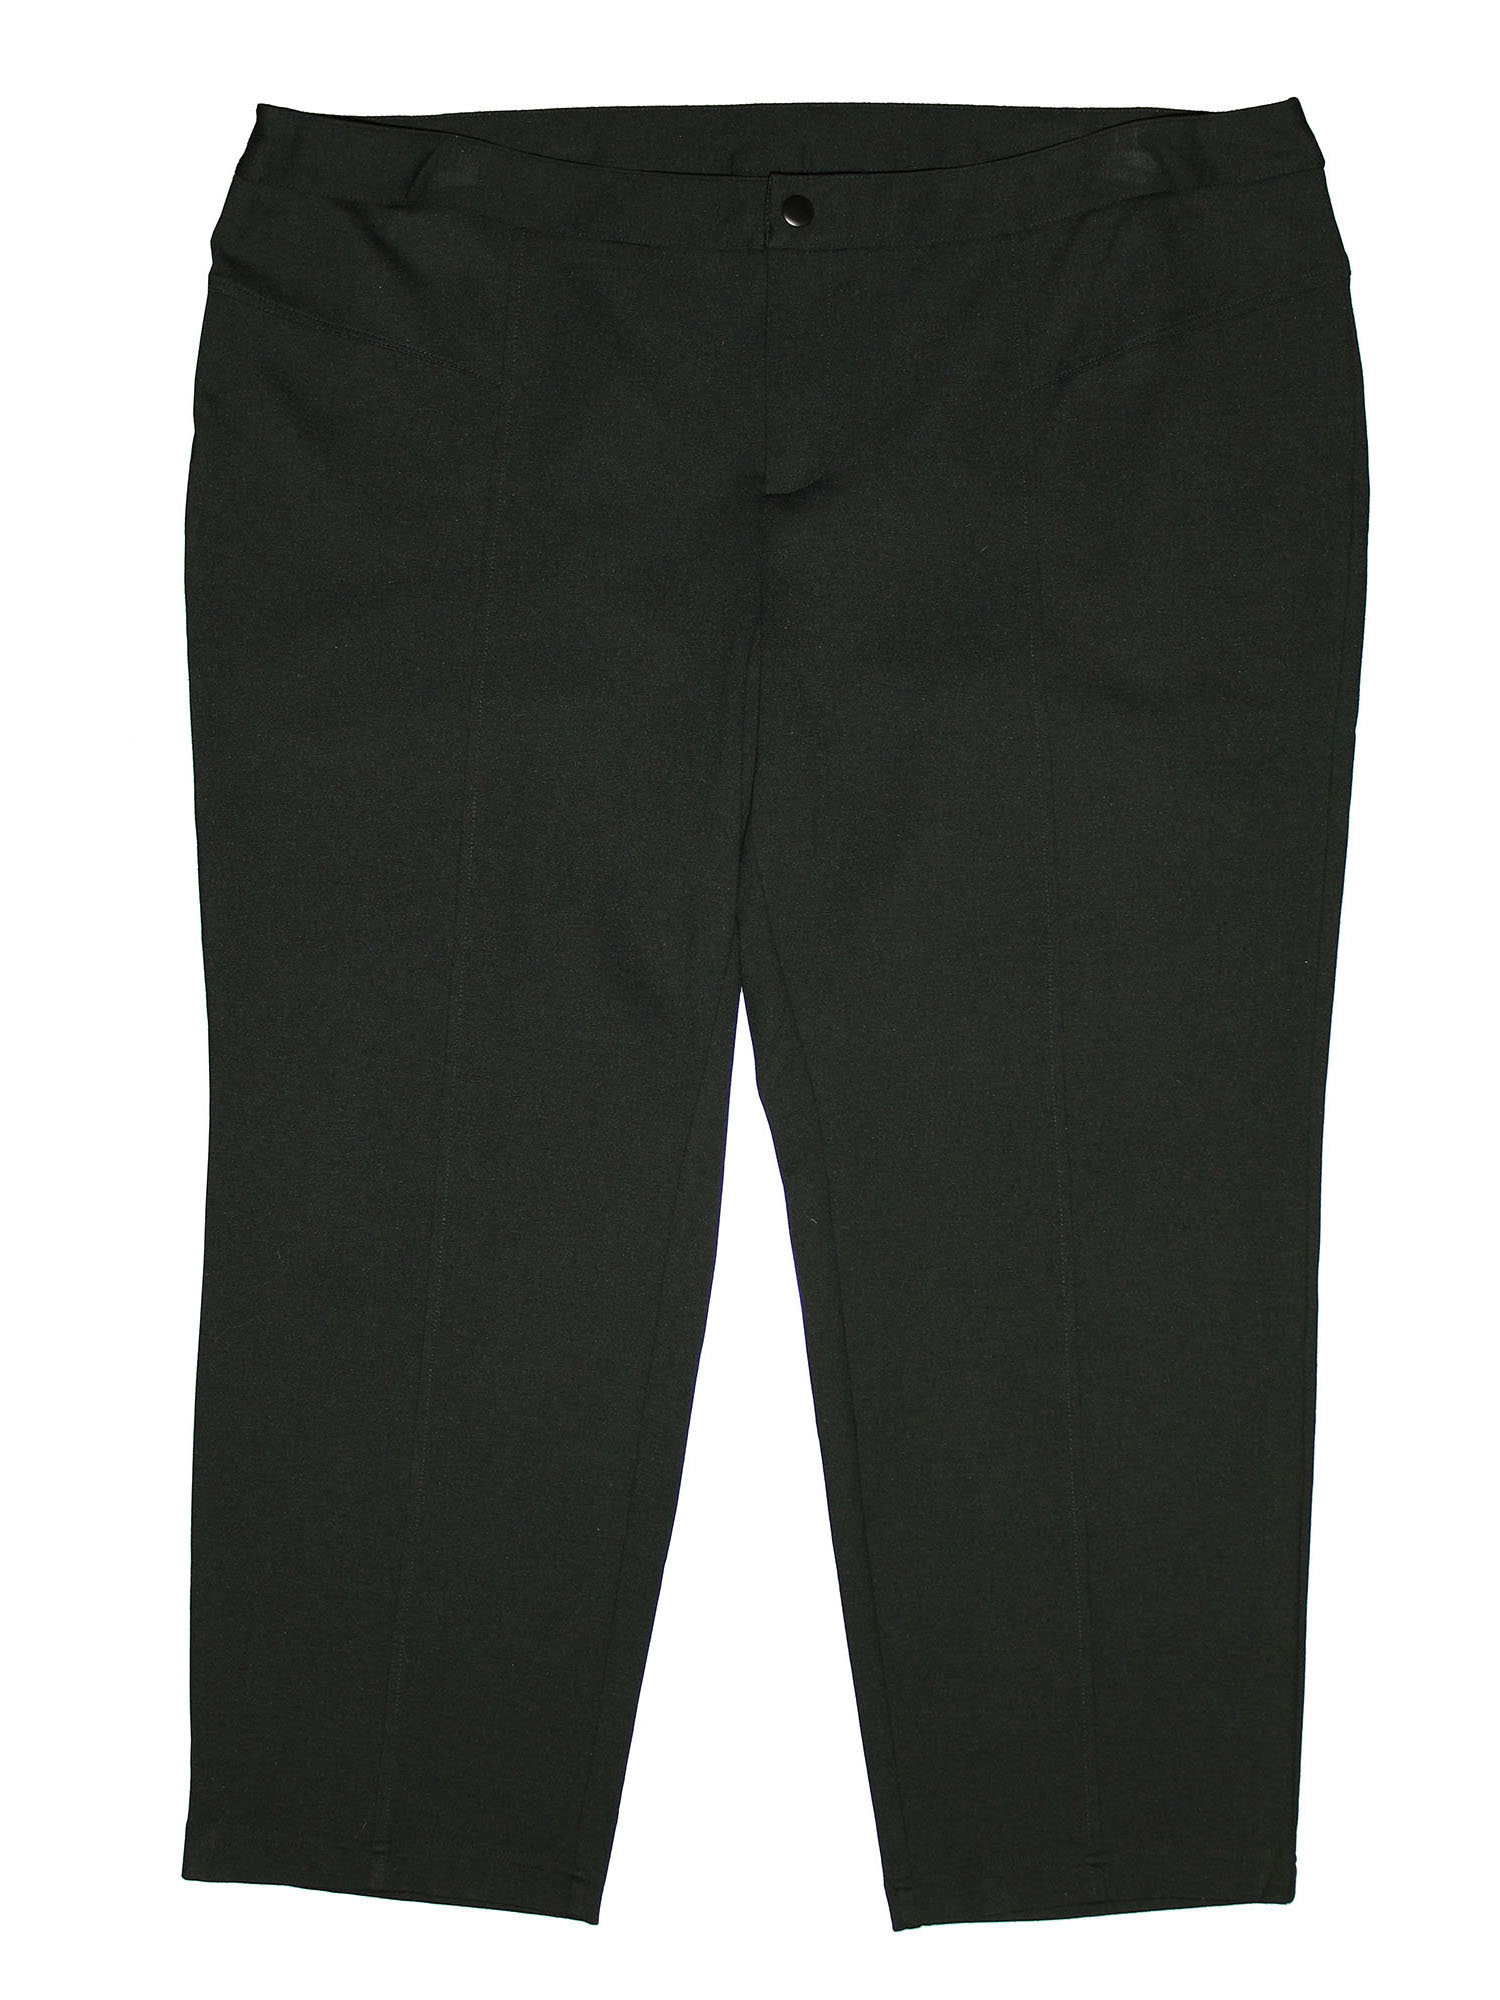 INC Women's Plus Size Tapered Straight Leg Casual Ponte Knit Pants 24w Petite Black